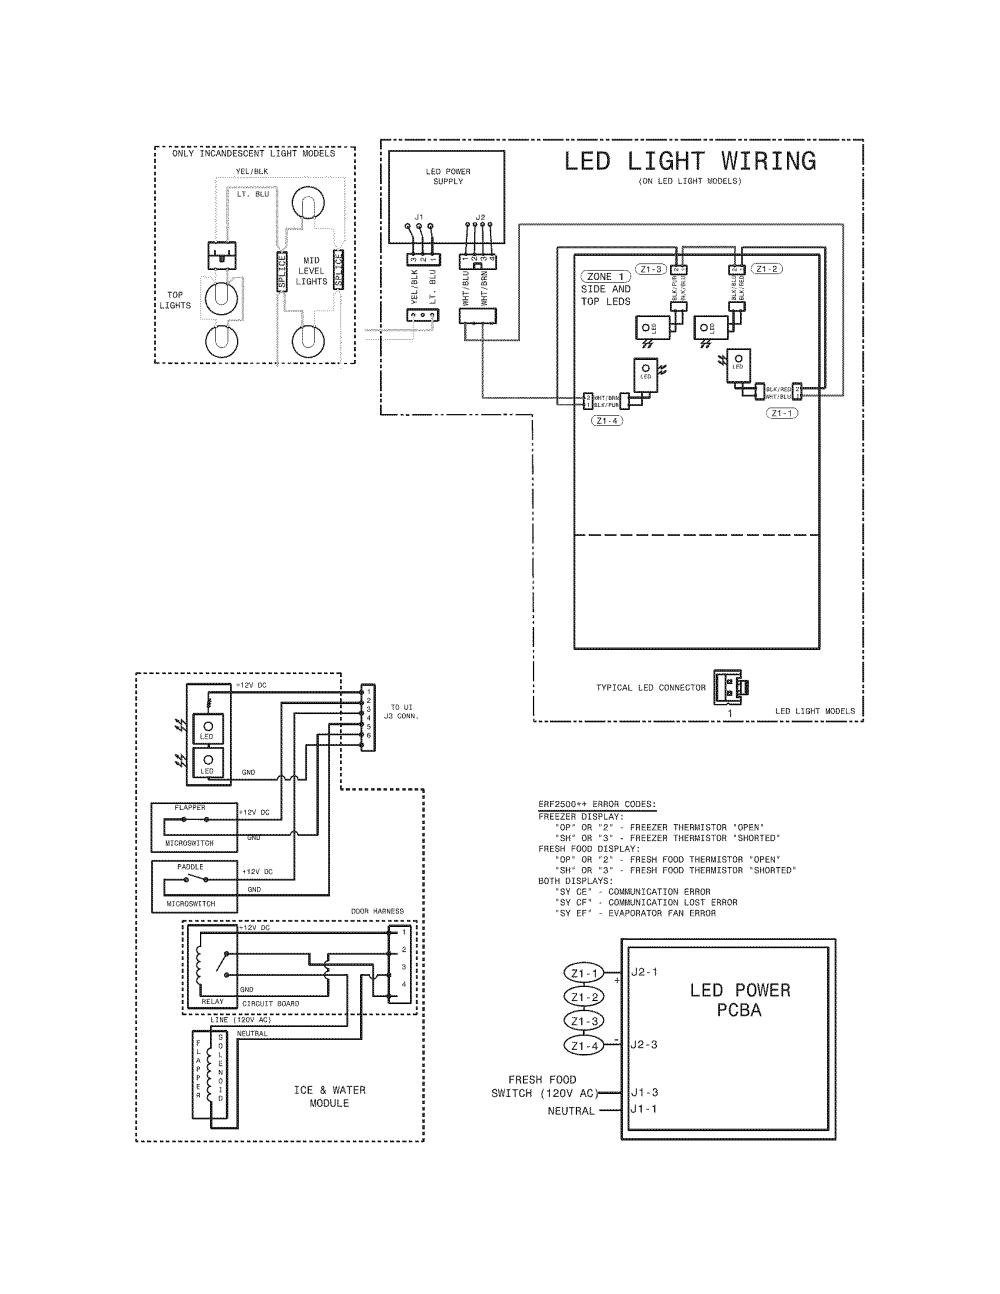 medium resolution of frigidaire refrigerator parts model fphf2399mf6 sears electric guitar pickup wiring diagrams kenmore upright freezer wiring diagram